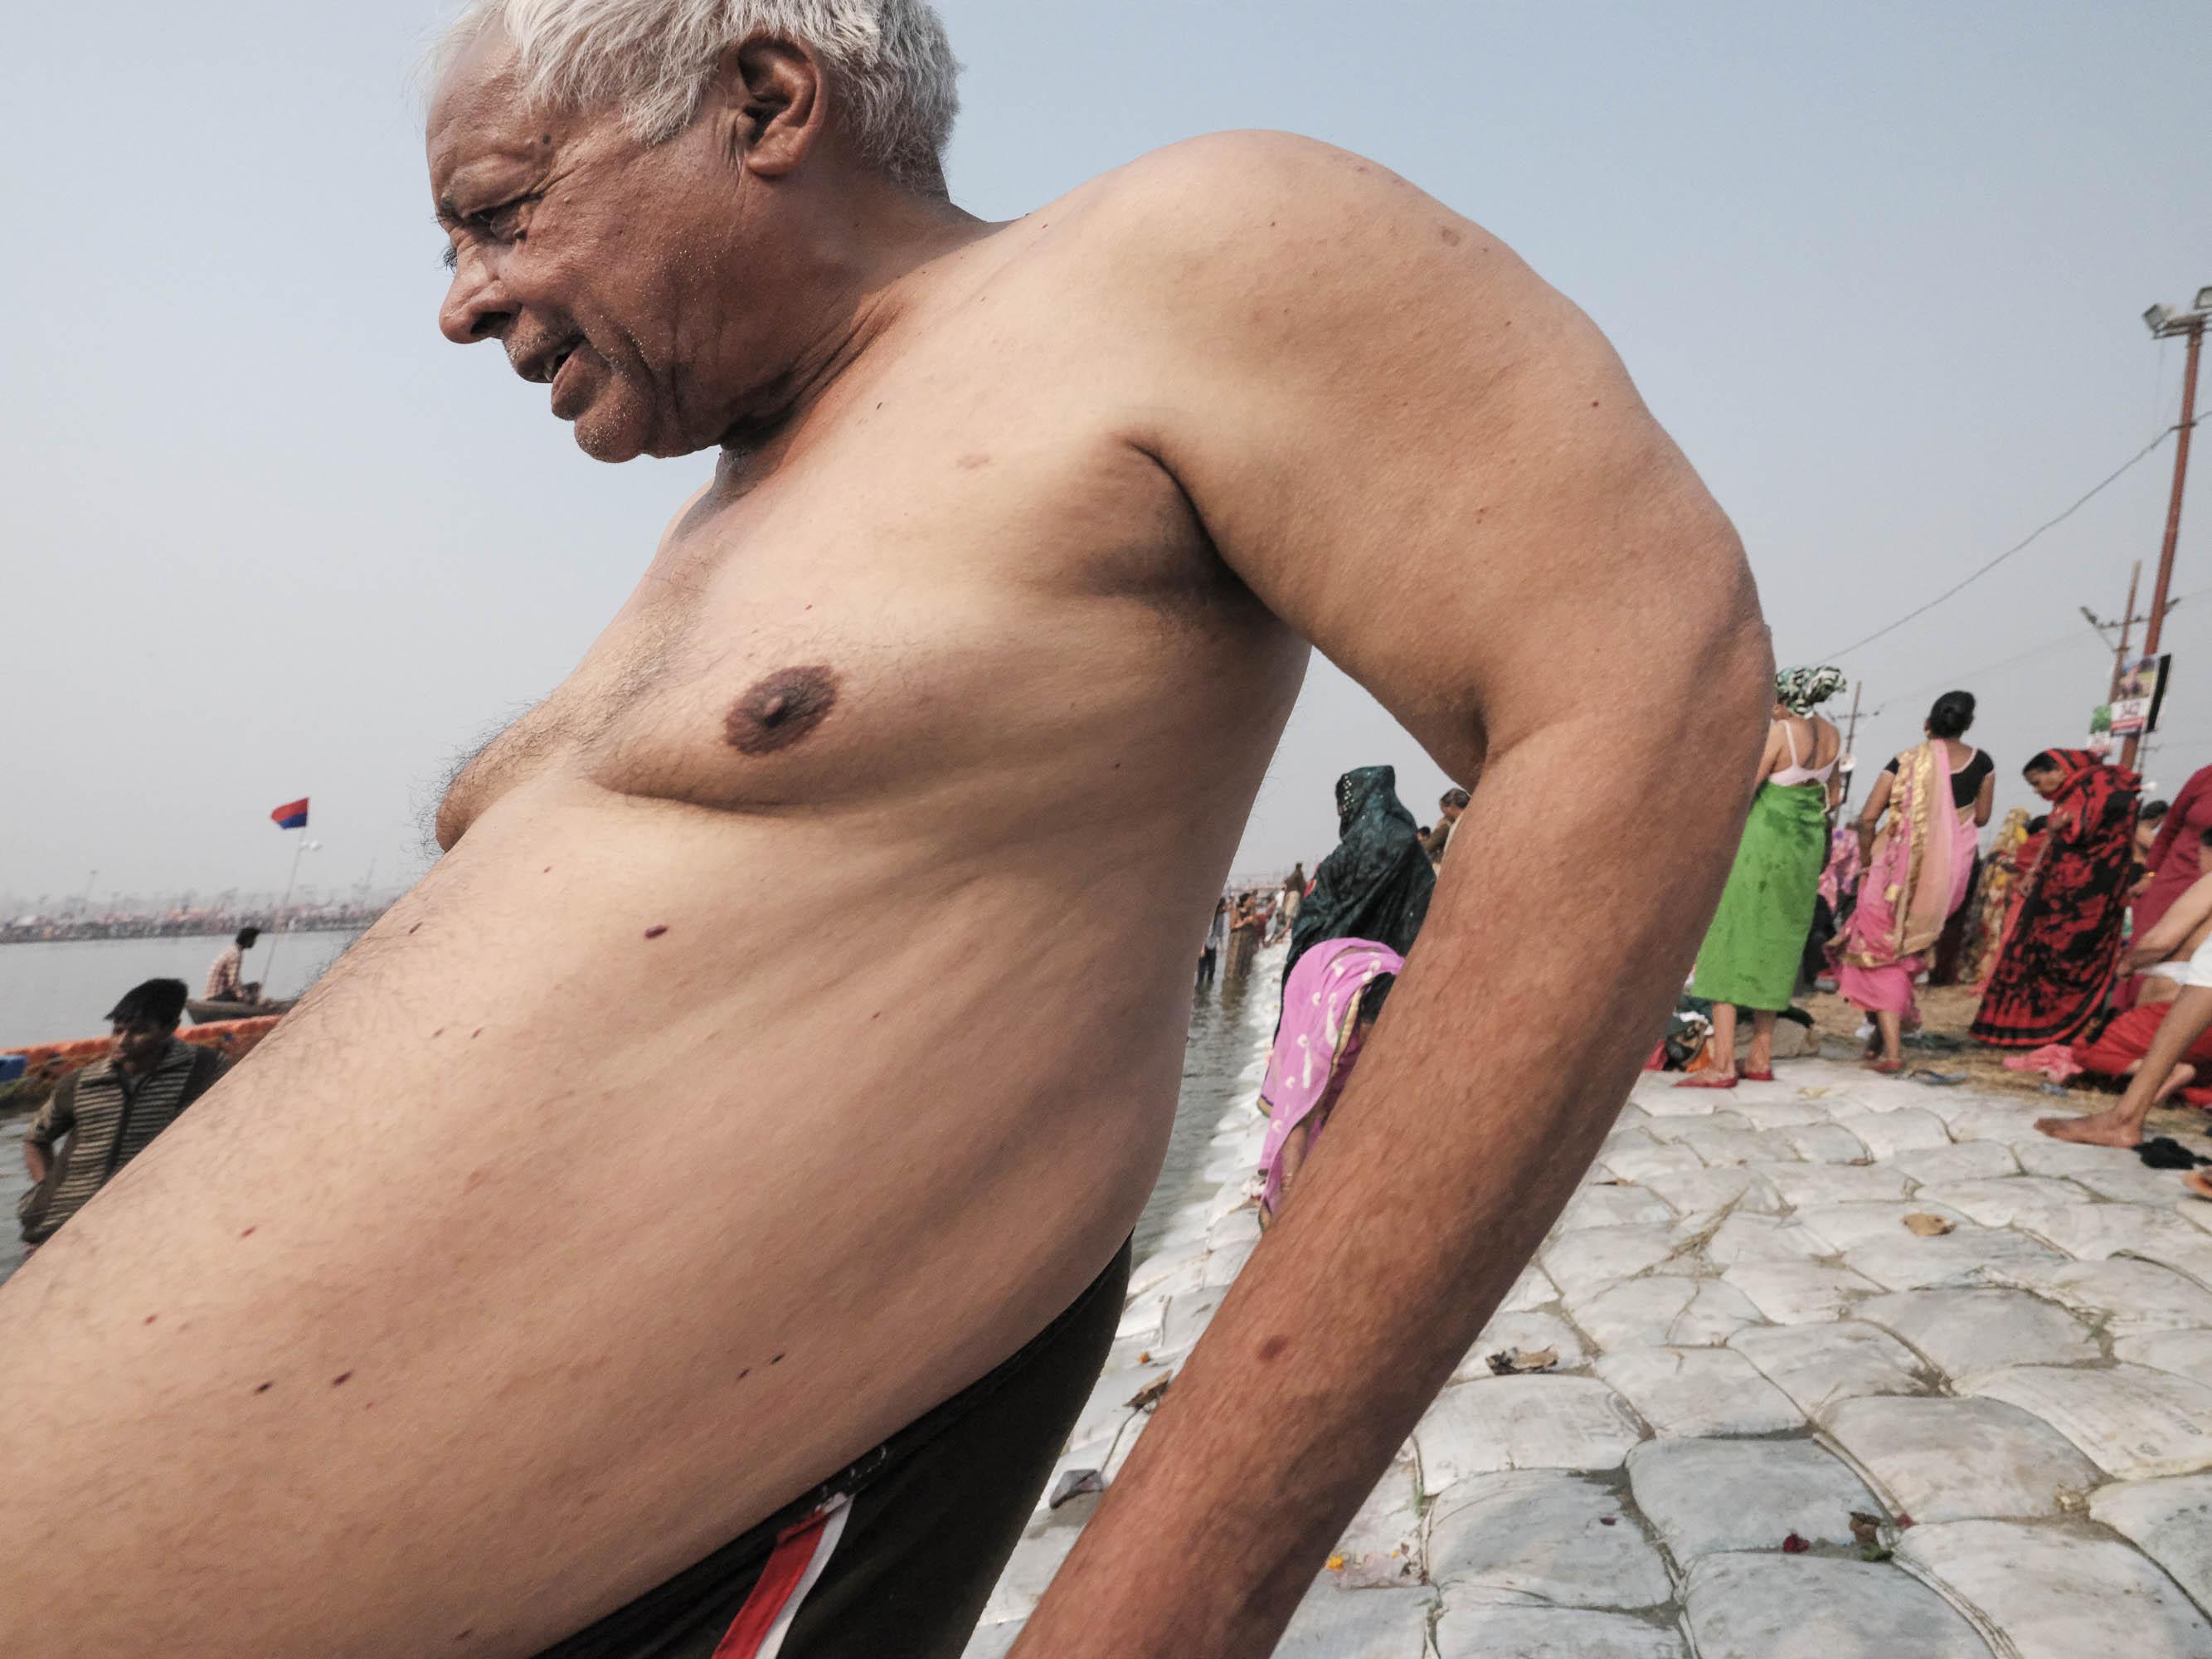 distortion image man bath pilgrims Kumbh mela 2019 India Allahabad Prayagraj Ardh hindu religious Festival event rivers photographer jose jeuland photography